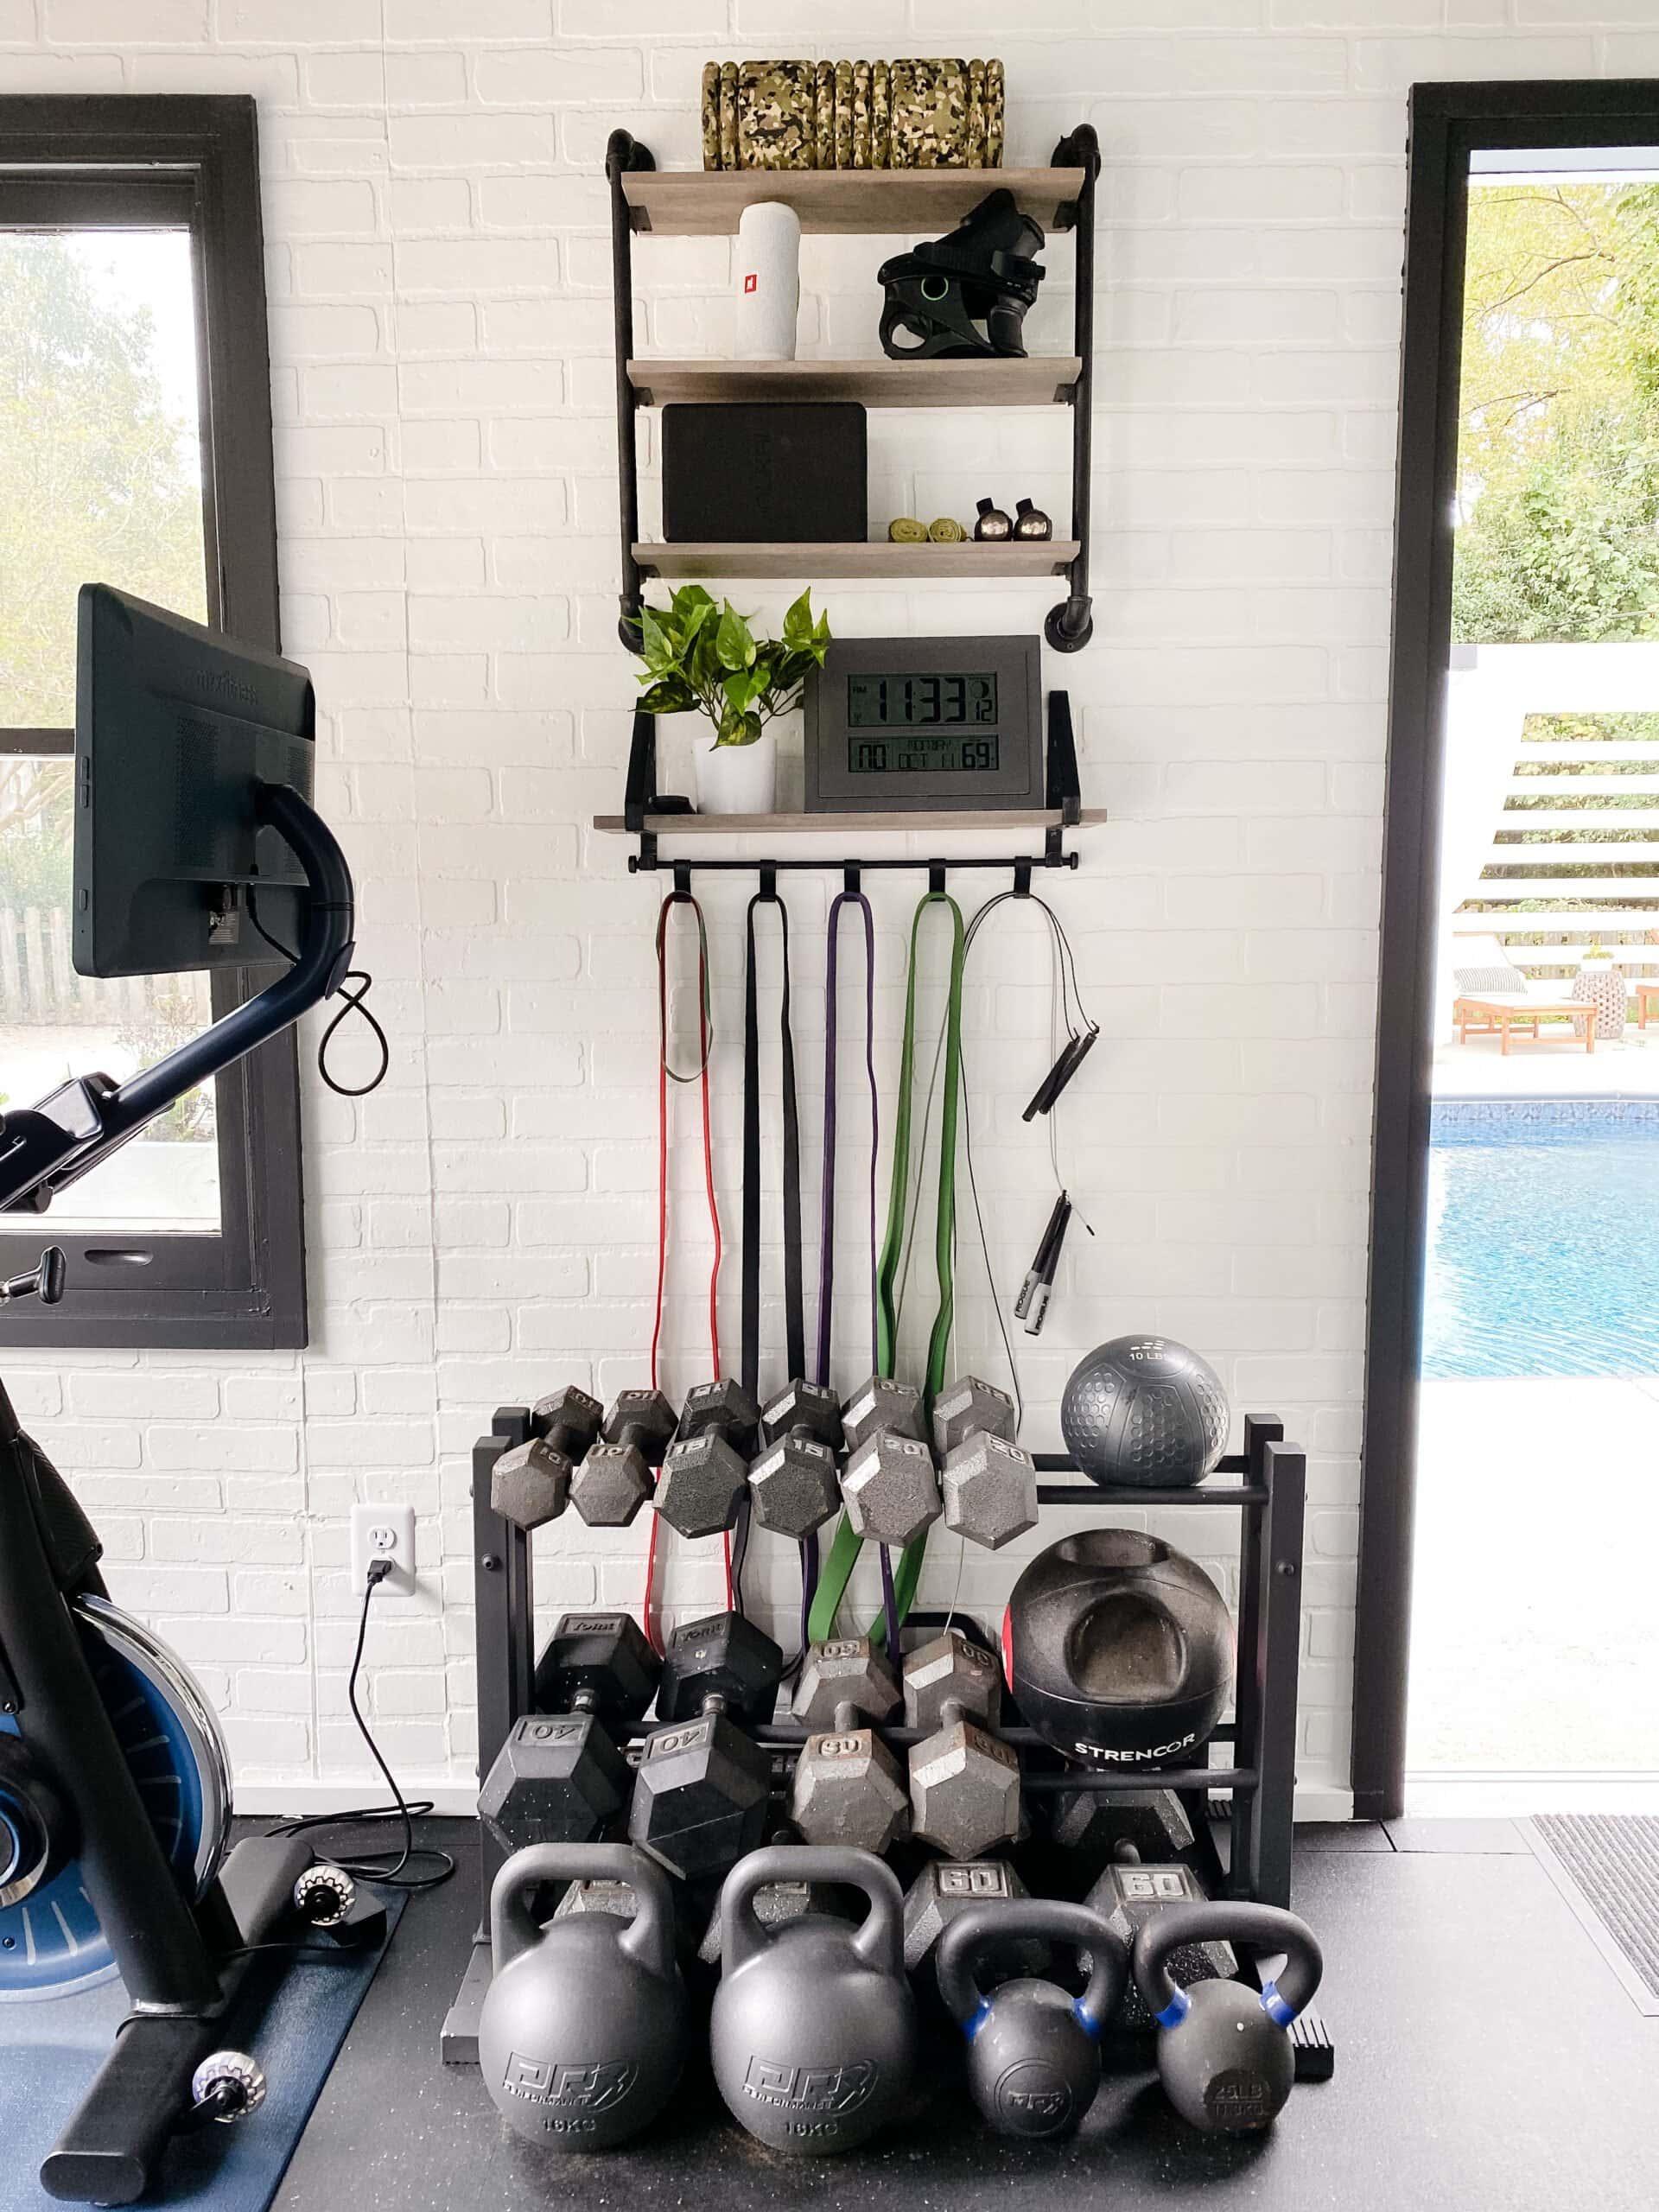 wall shelves for storing home gym equipment